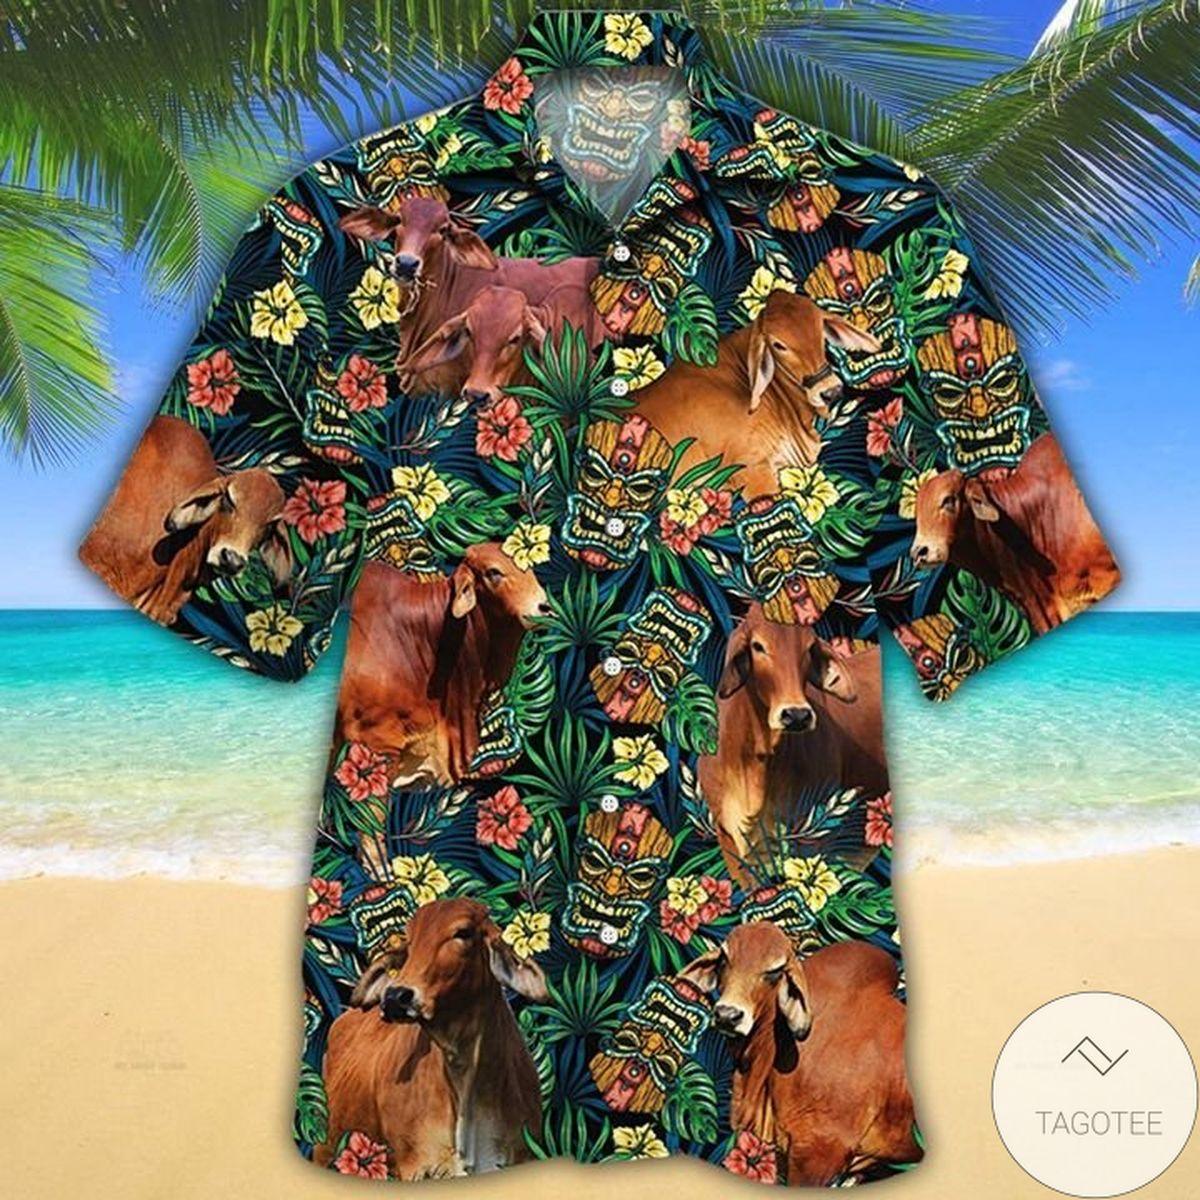 Red Brahman Cattle Lovers Tribal Tiki Mask Hawaiian Shirt